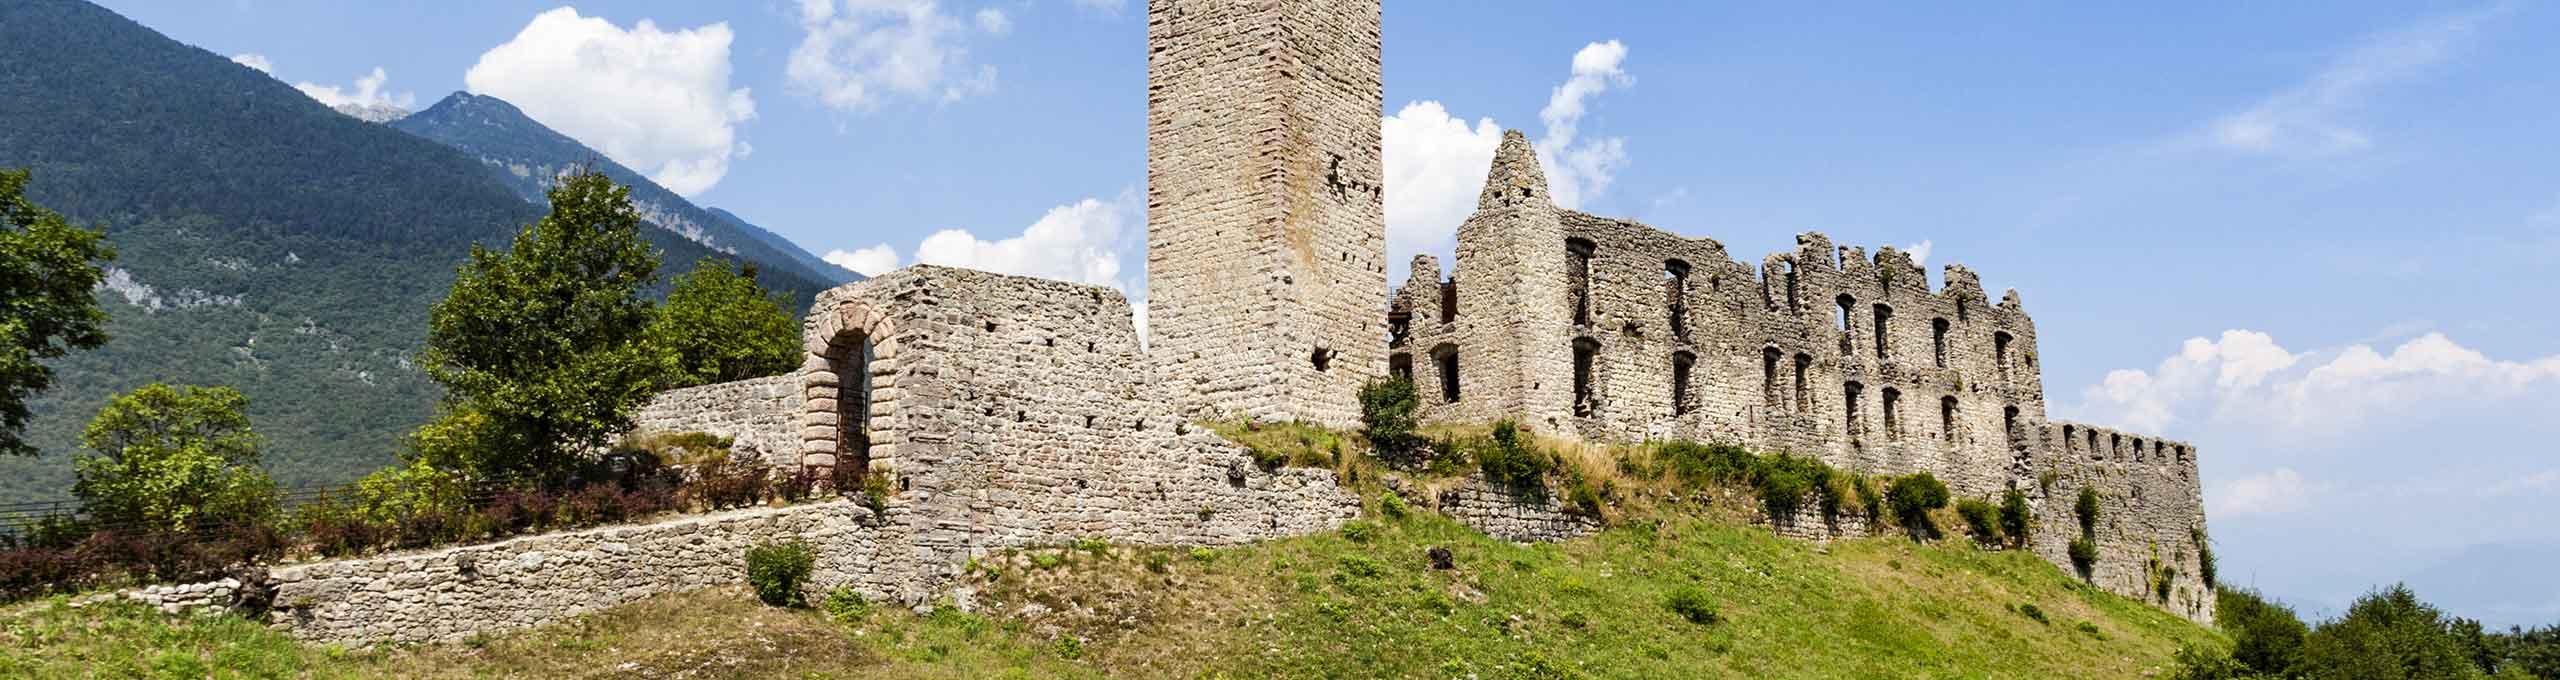 Rovine del Castello Belfort